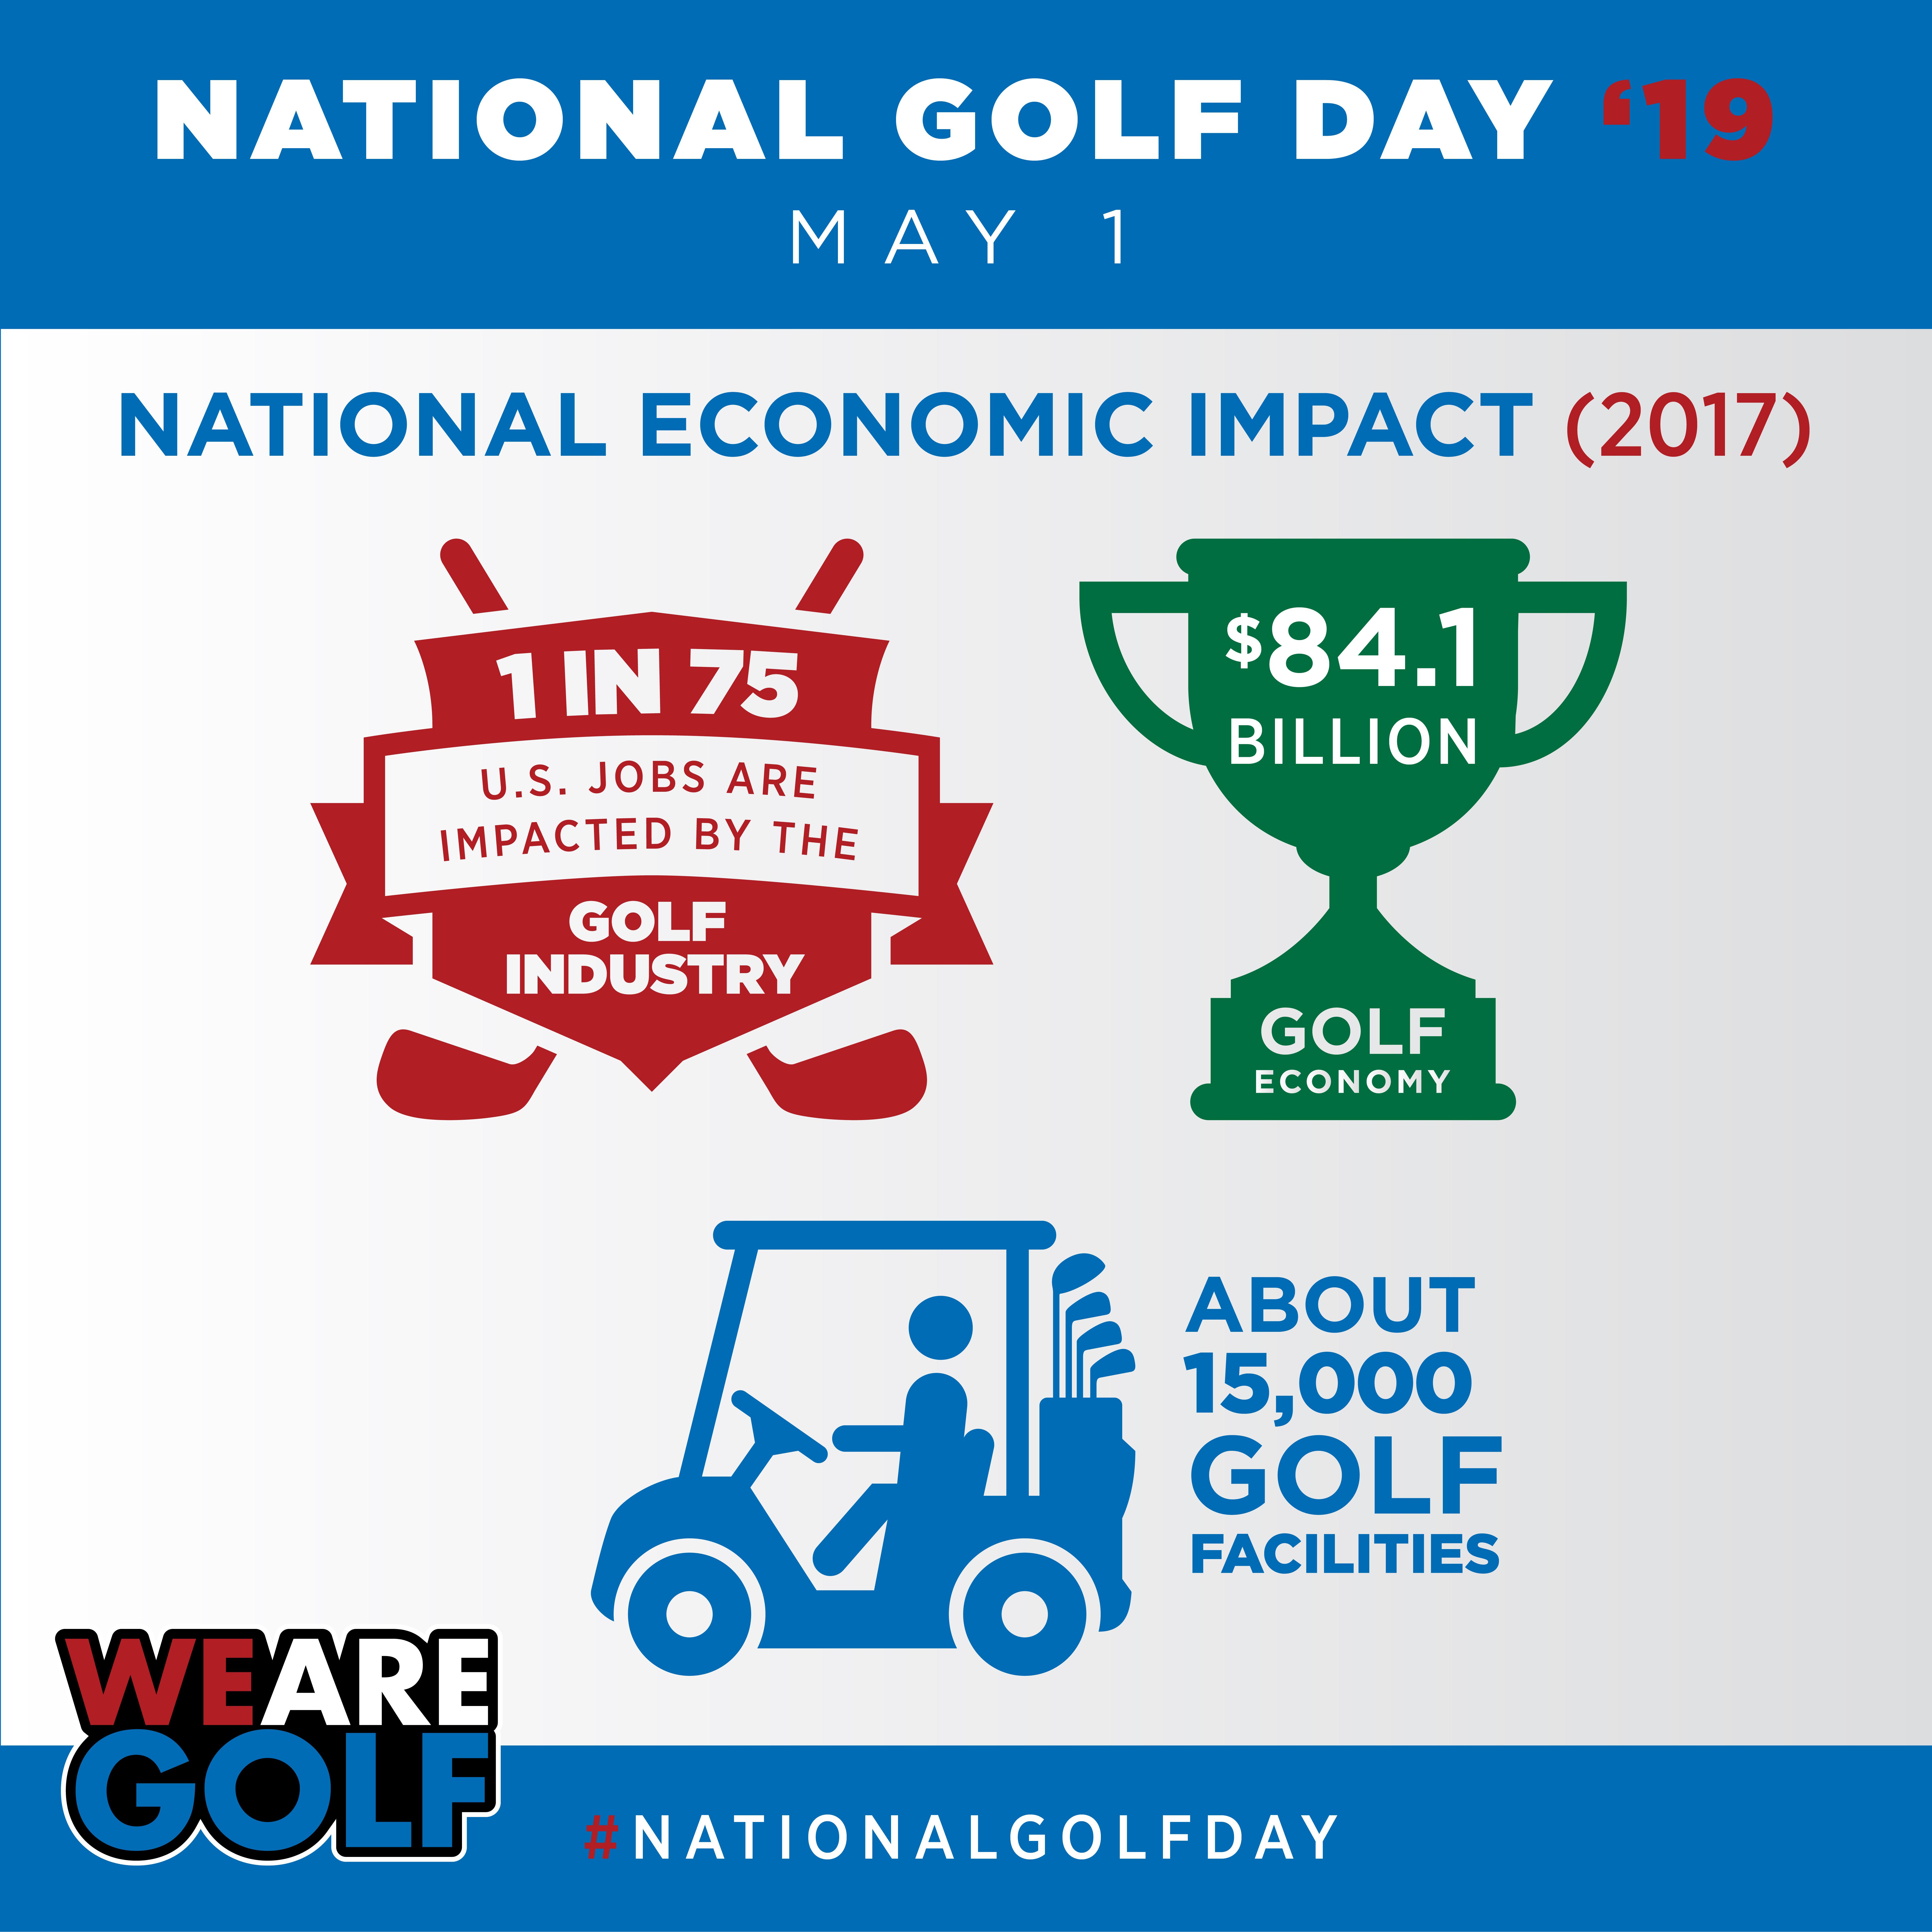 2019 National Golf Day Economic Impact